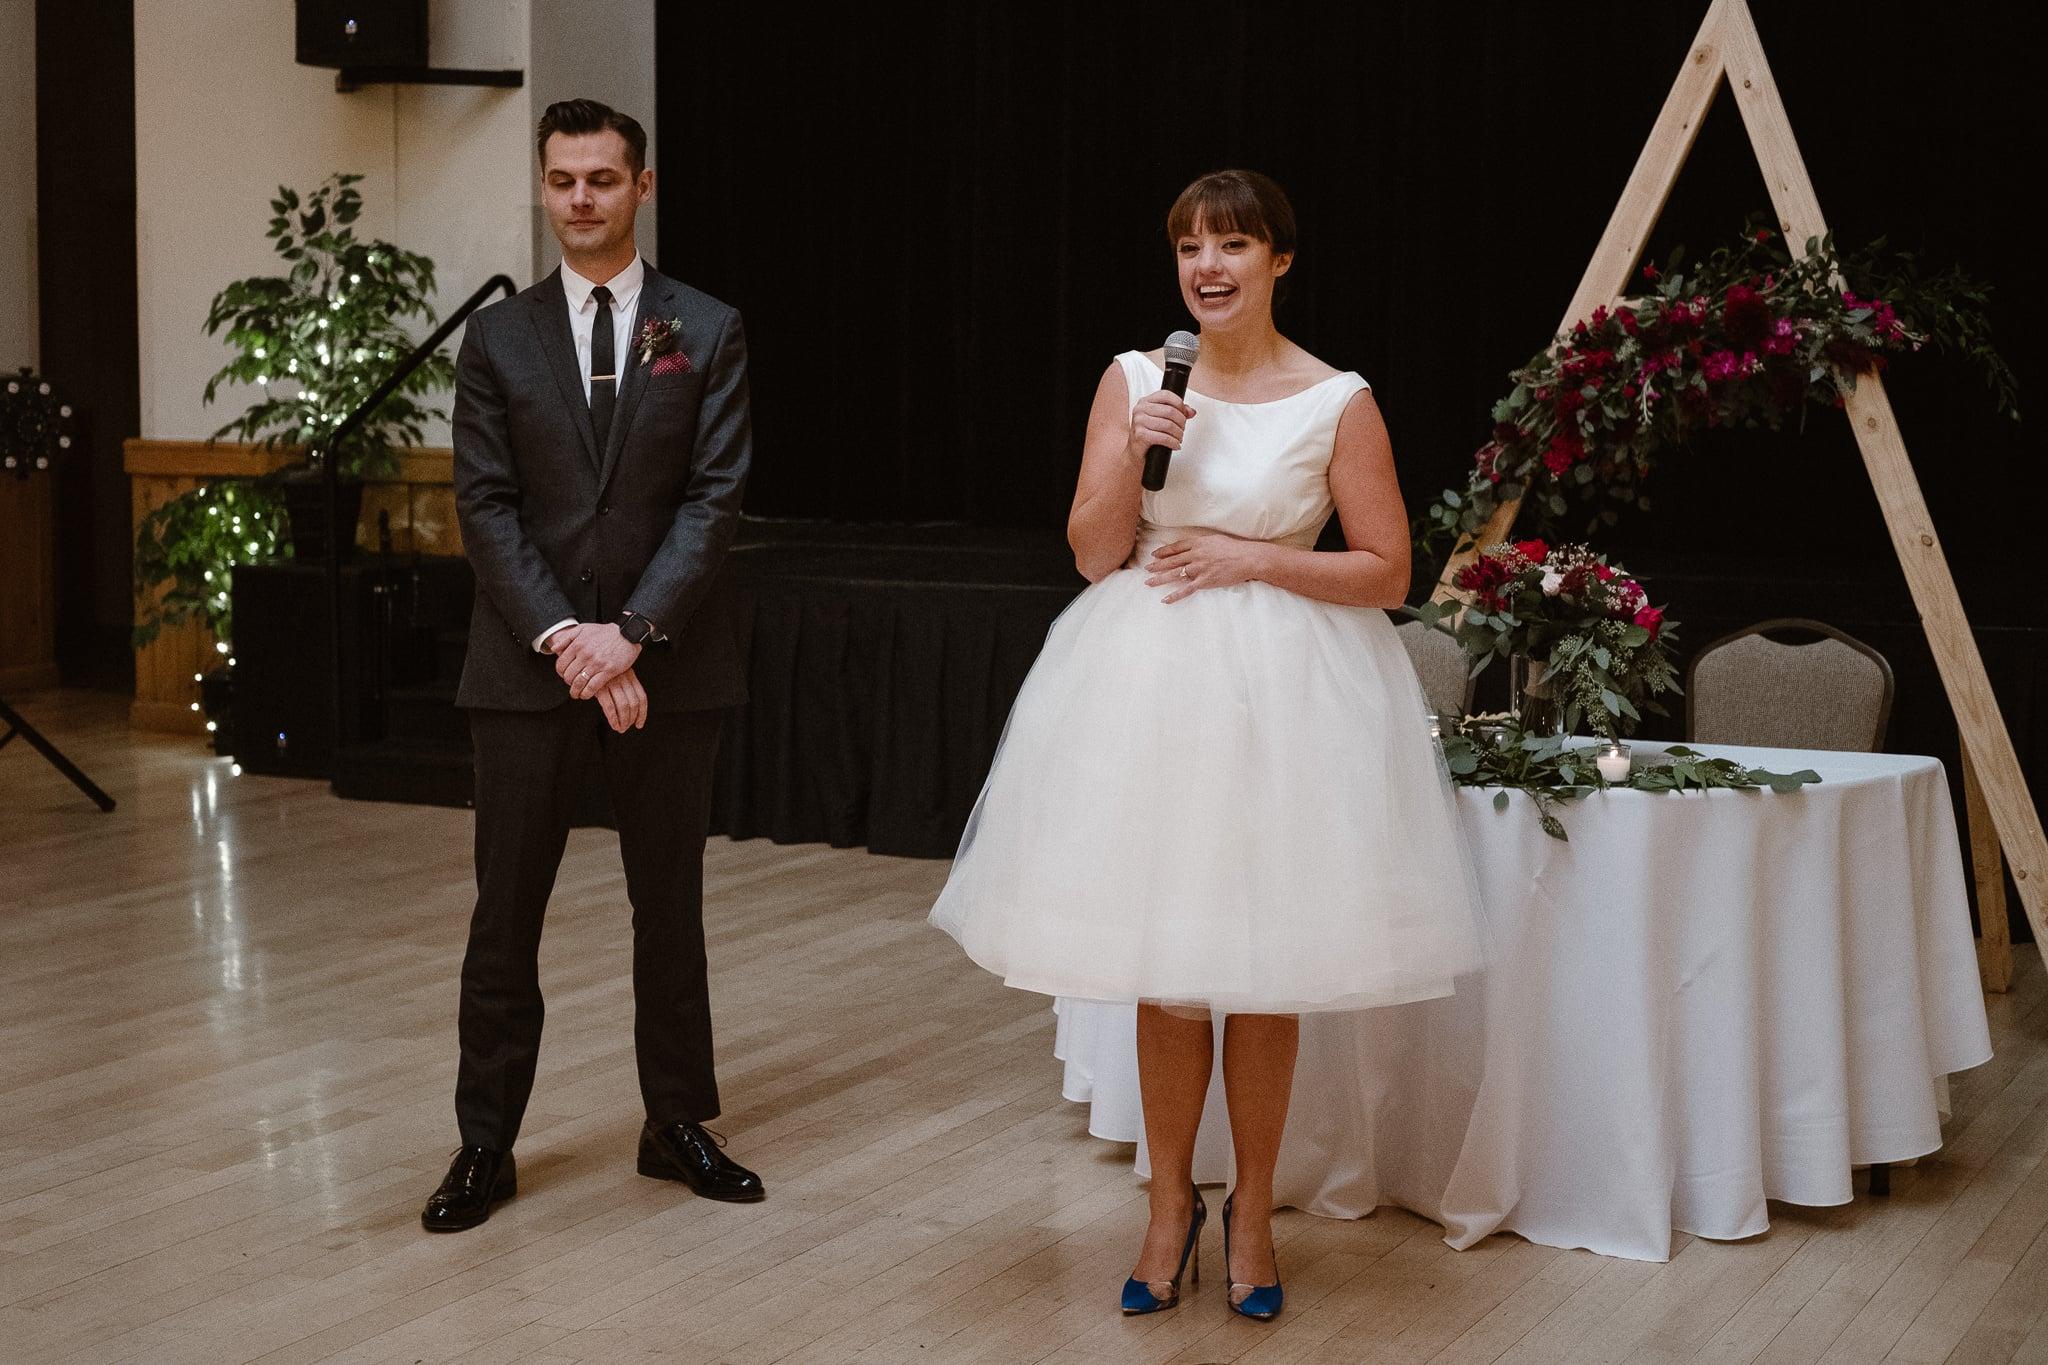 Silverthorne Pavilion wedding photography, Colorado wedding photographer, bride and groom welcome toast